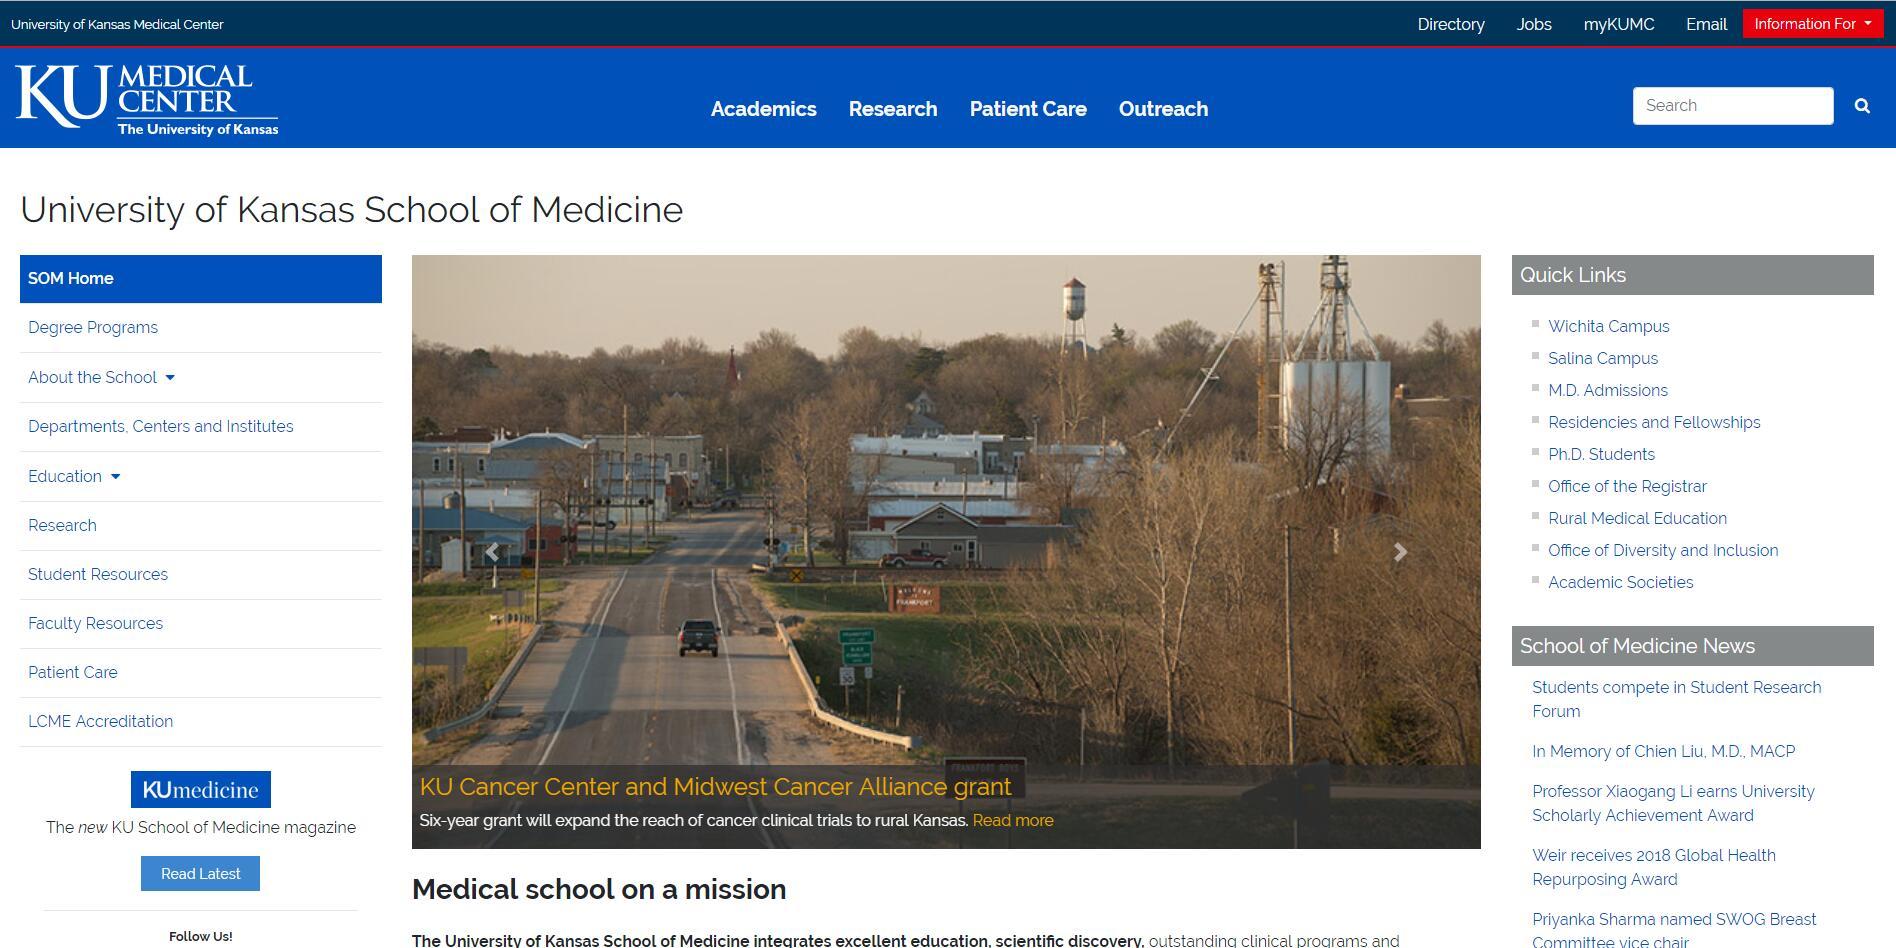 The School of Medicine at University of Kansas